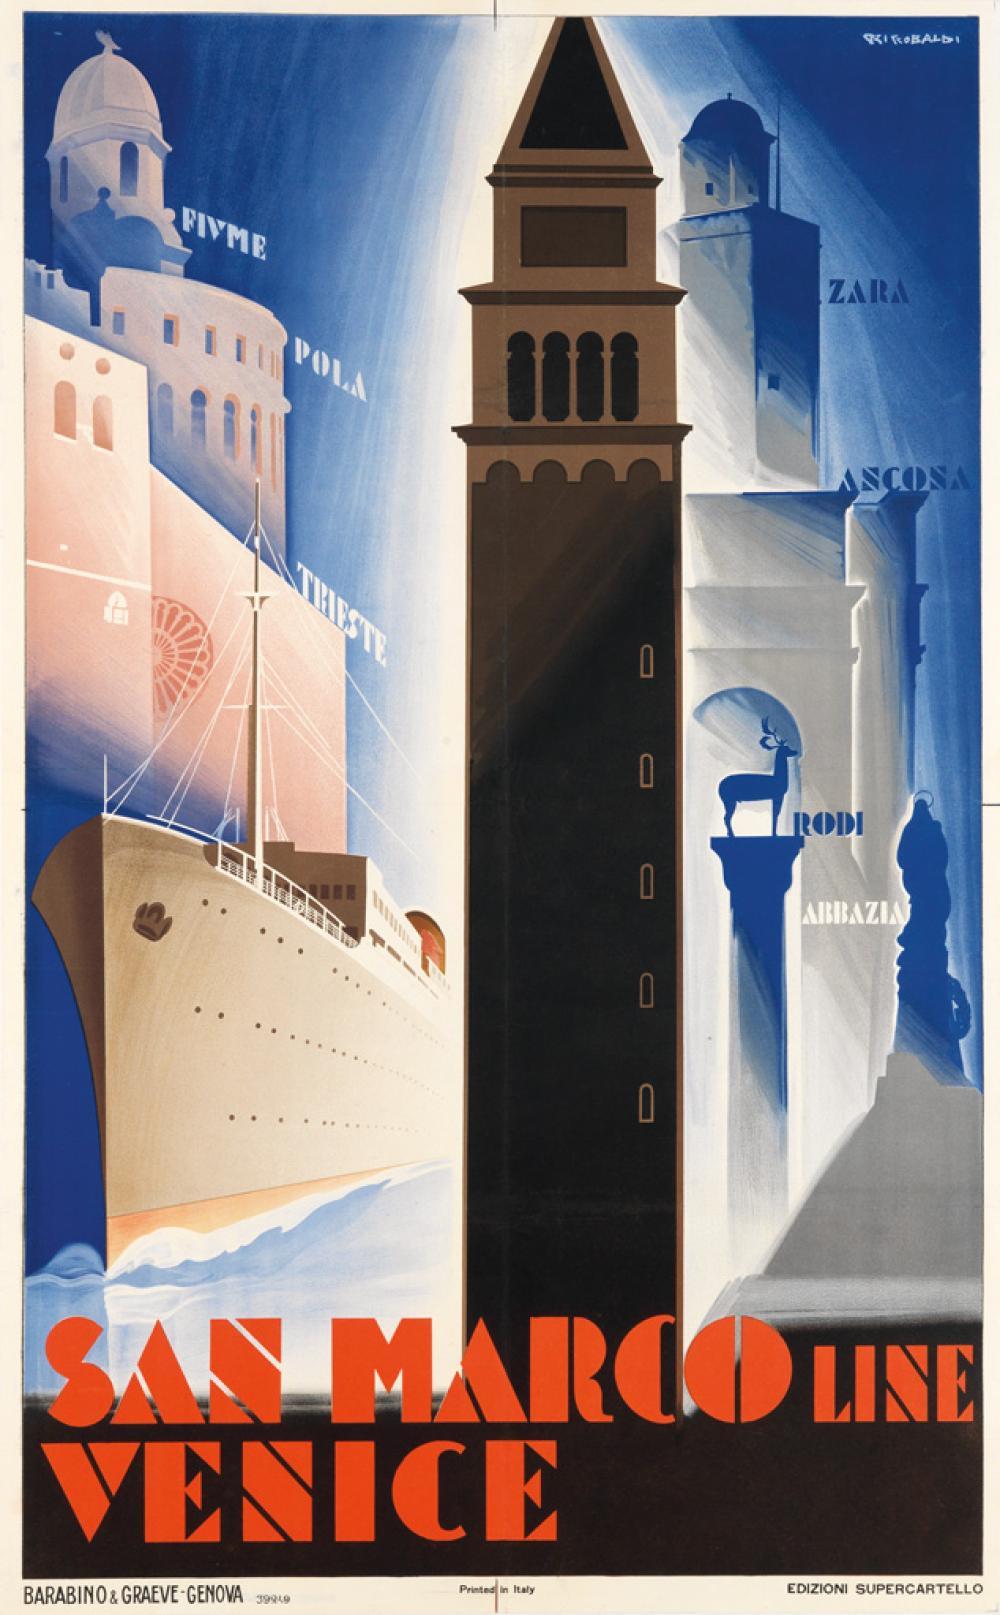 GIUSEPPE RICCOBALDI (1887-1976). SAN MARCO LINE / VENICE. Circa 1930. 39x24 inches, 99x61 cm. Barabino & Graeve, Genova.